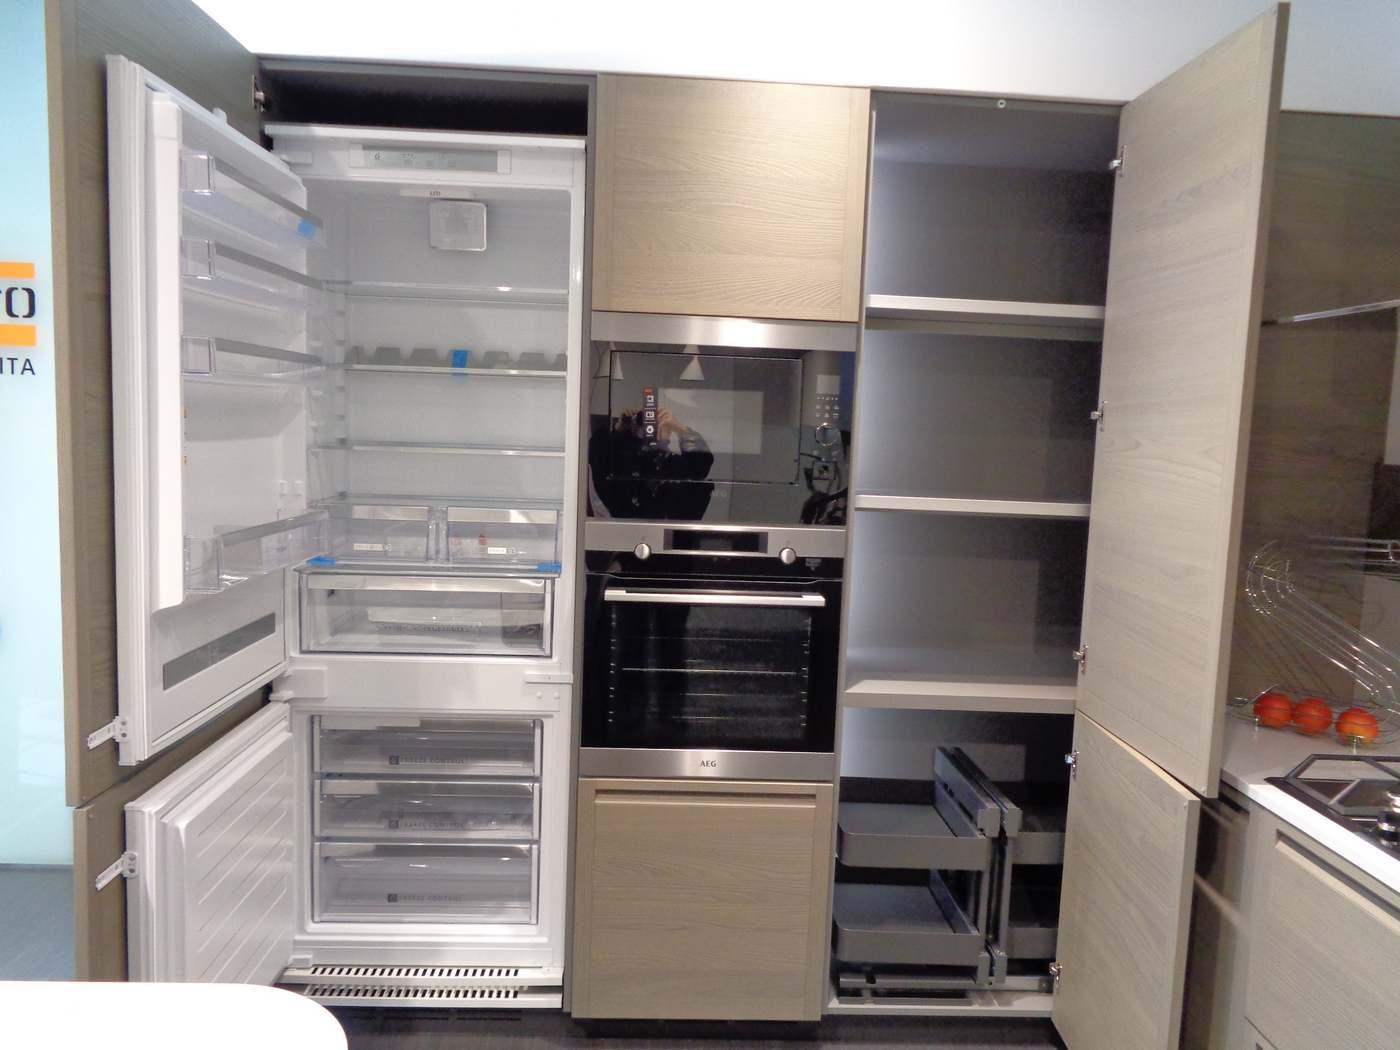 frigo da 400 lt cm. 70 Whirlpool classe A+